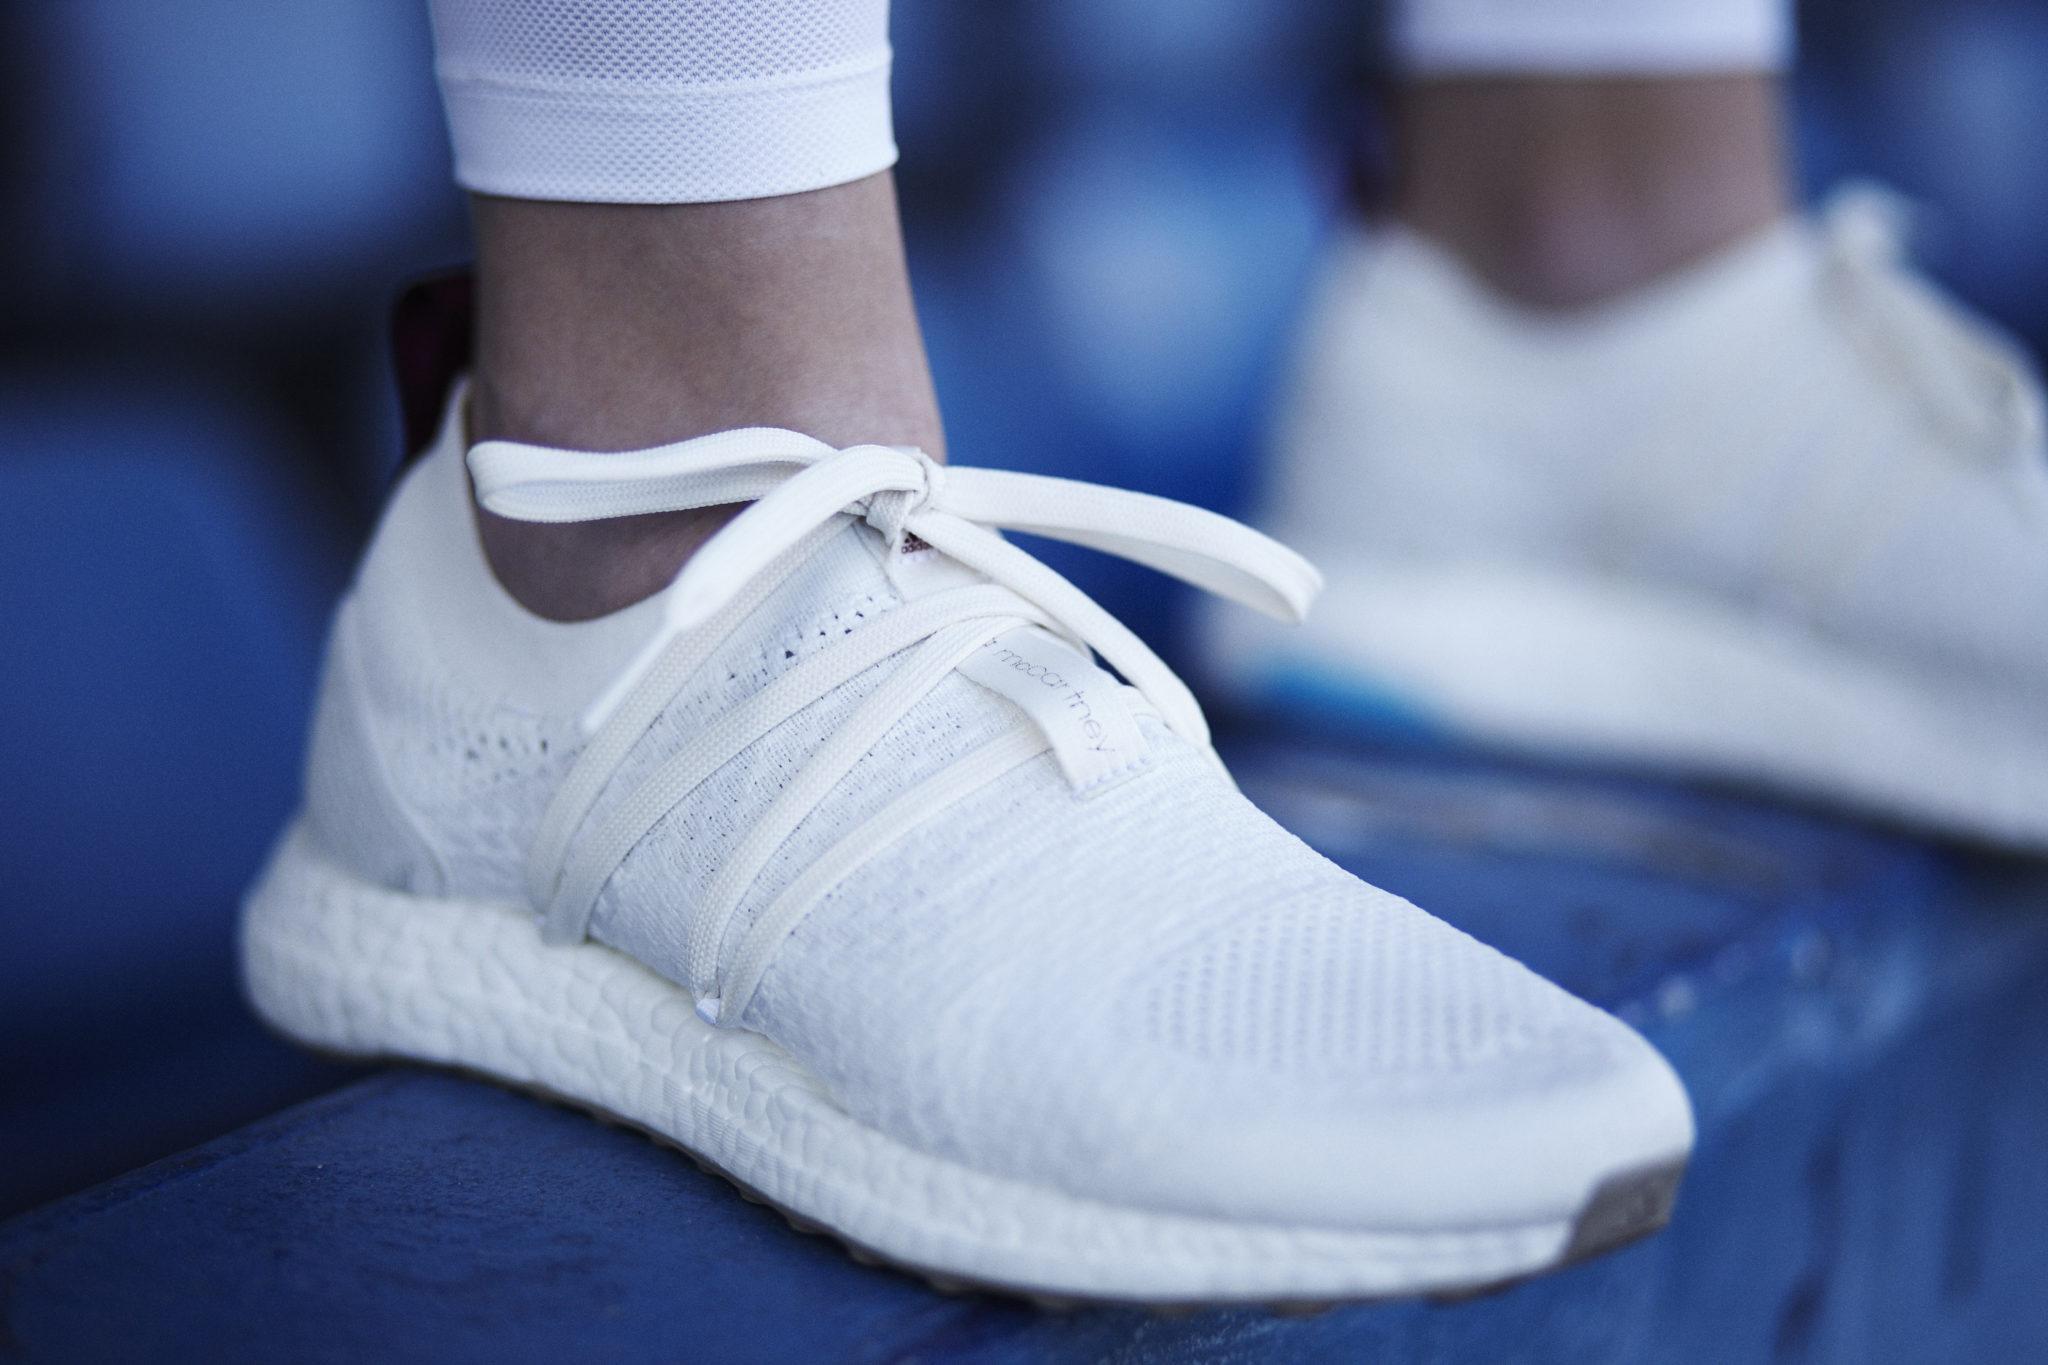 Adidas By Stella Mccartney Ultraboost Parley Sneakers